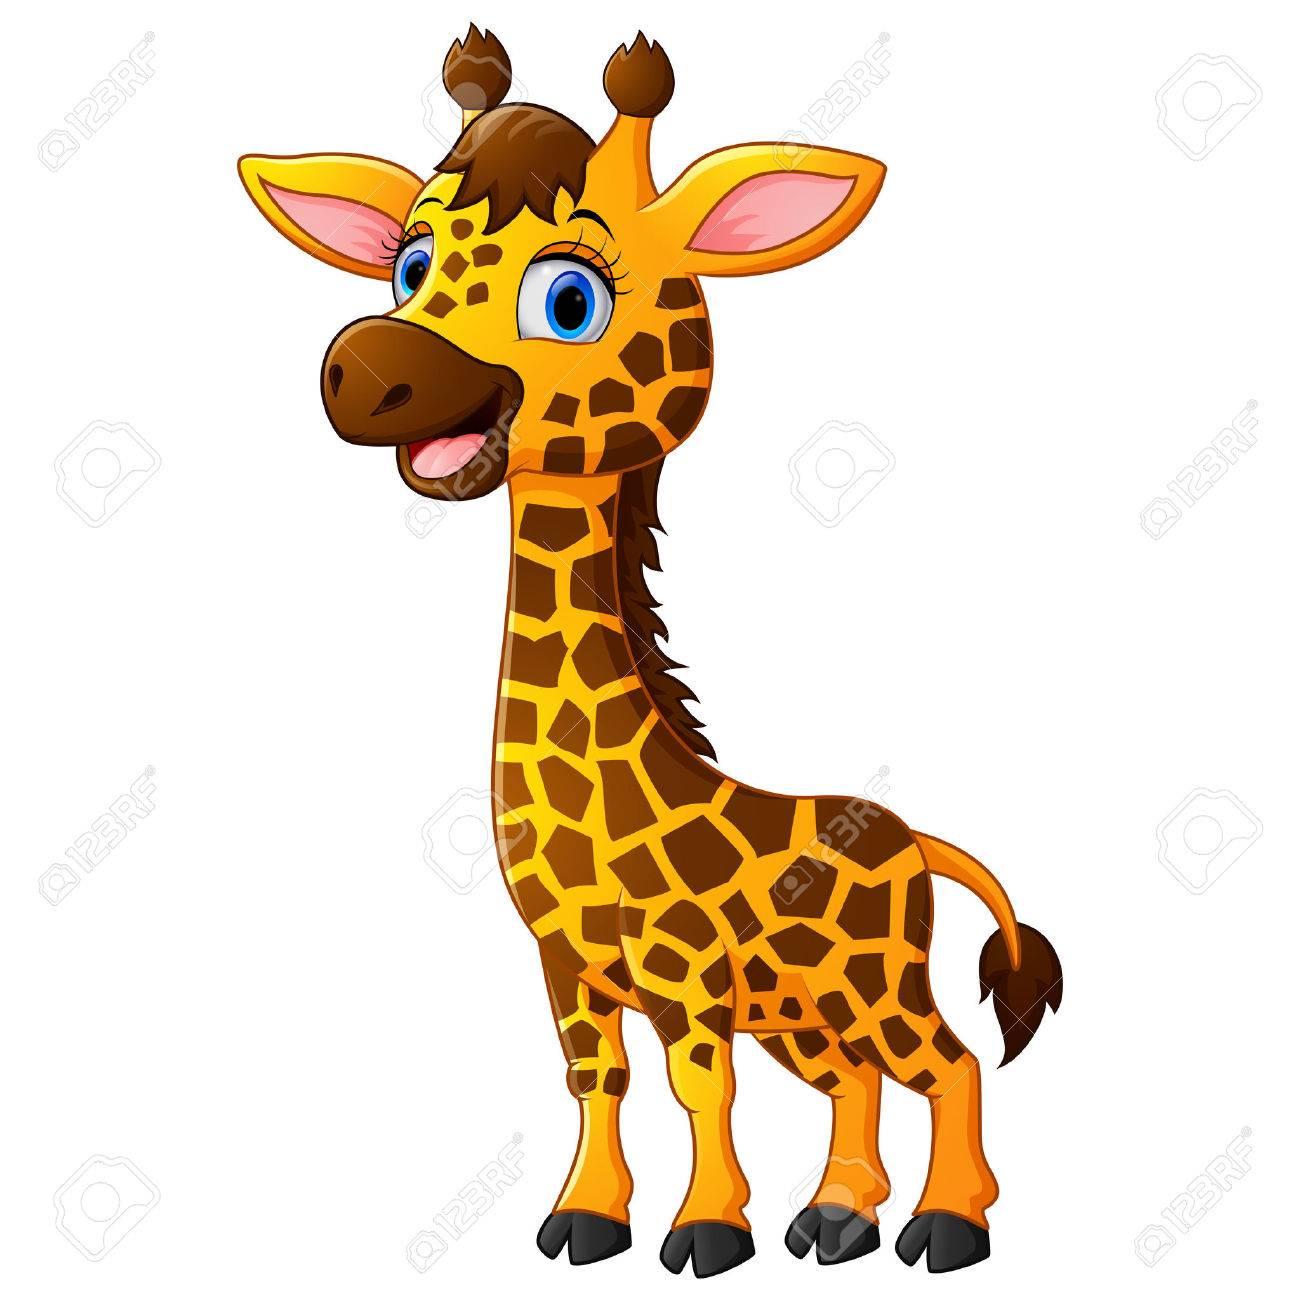 cute giraffe cartoon stock photo picture and royalty free image rh 123rf com funny giraffe cartoon images giraffe cartoon images free download